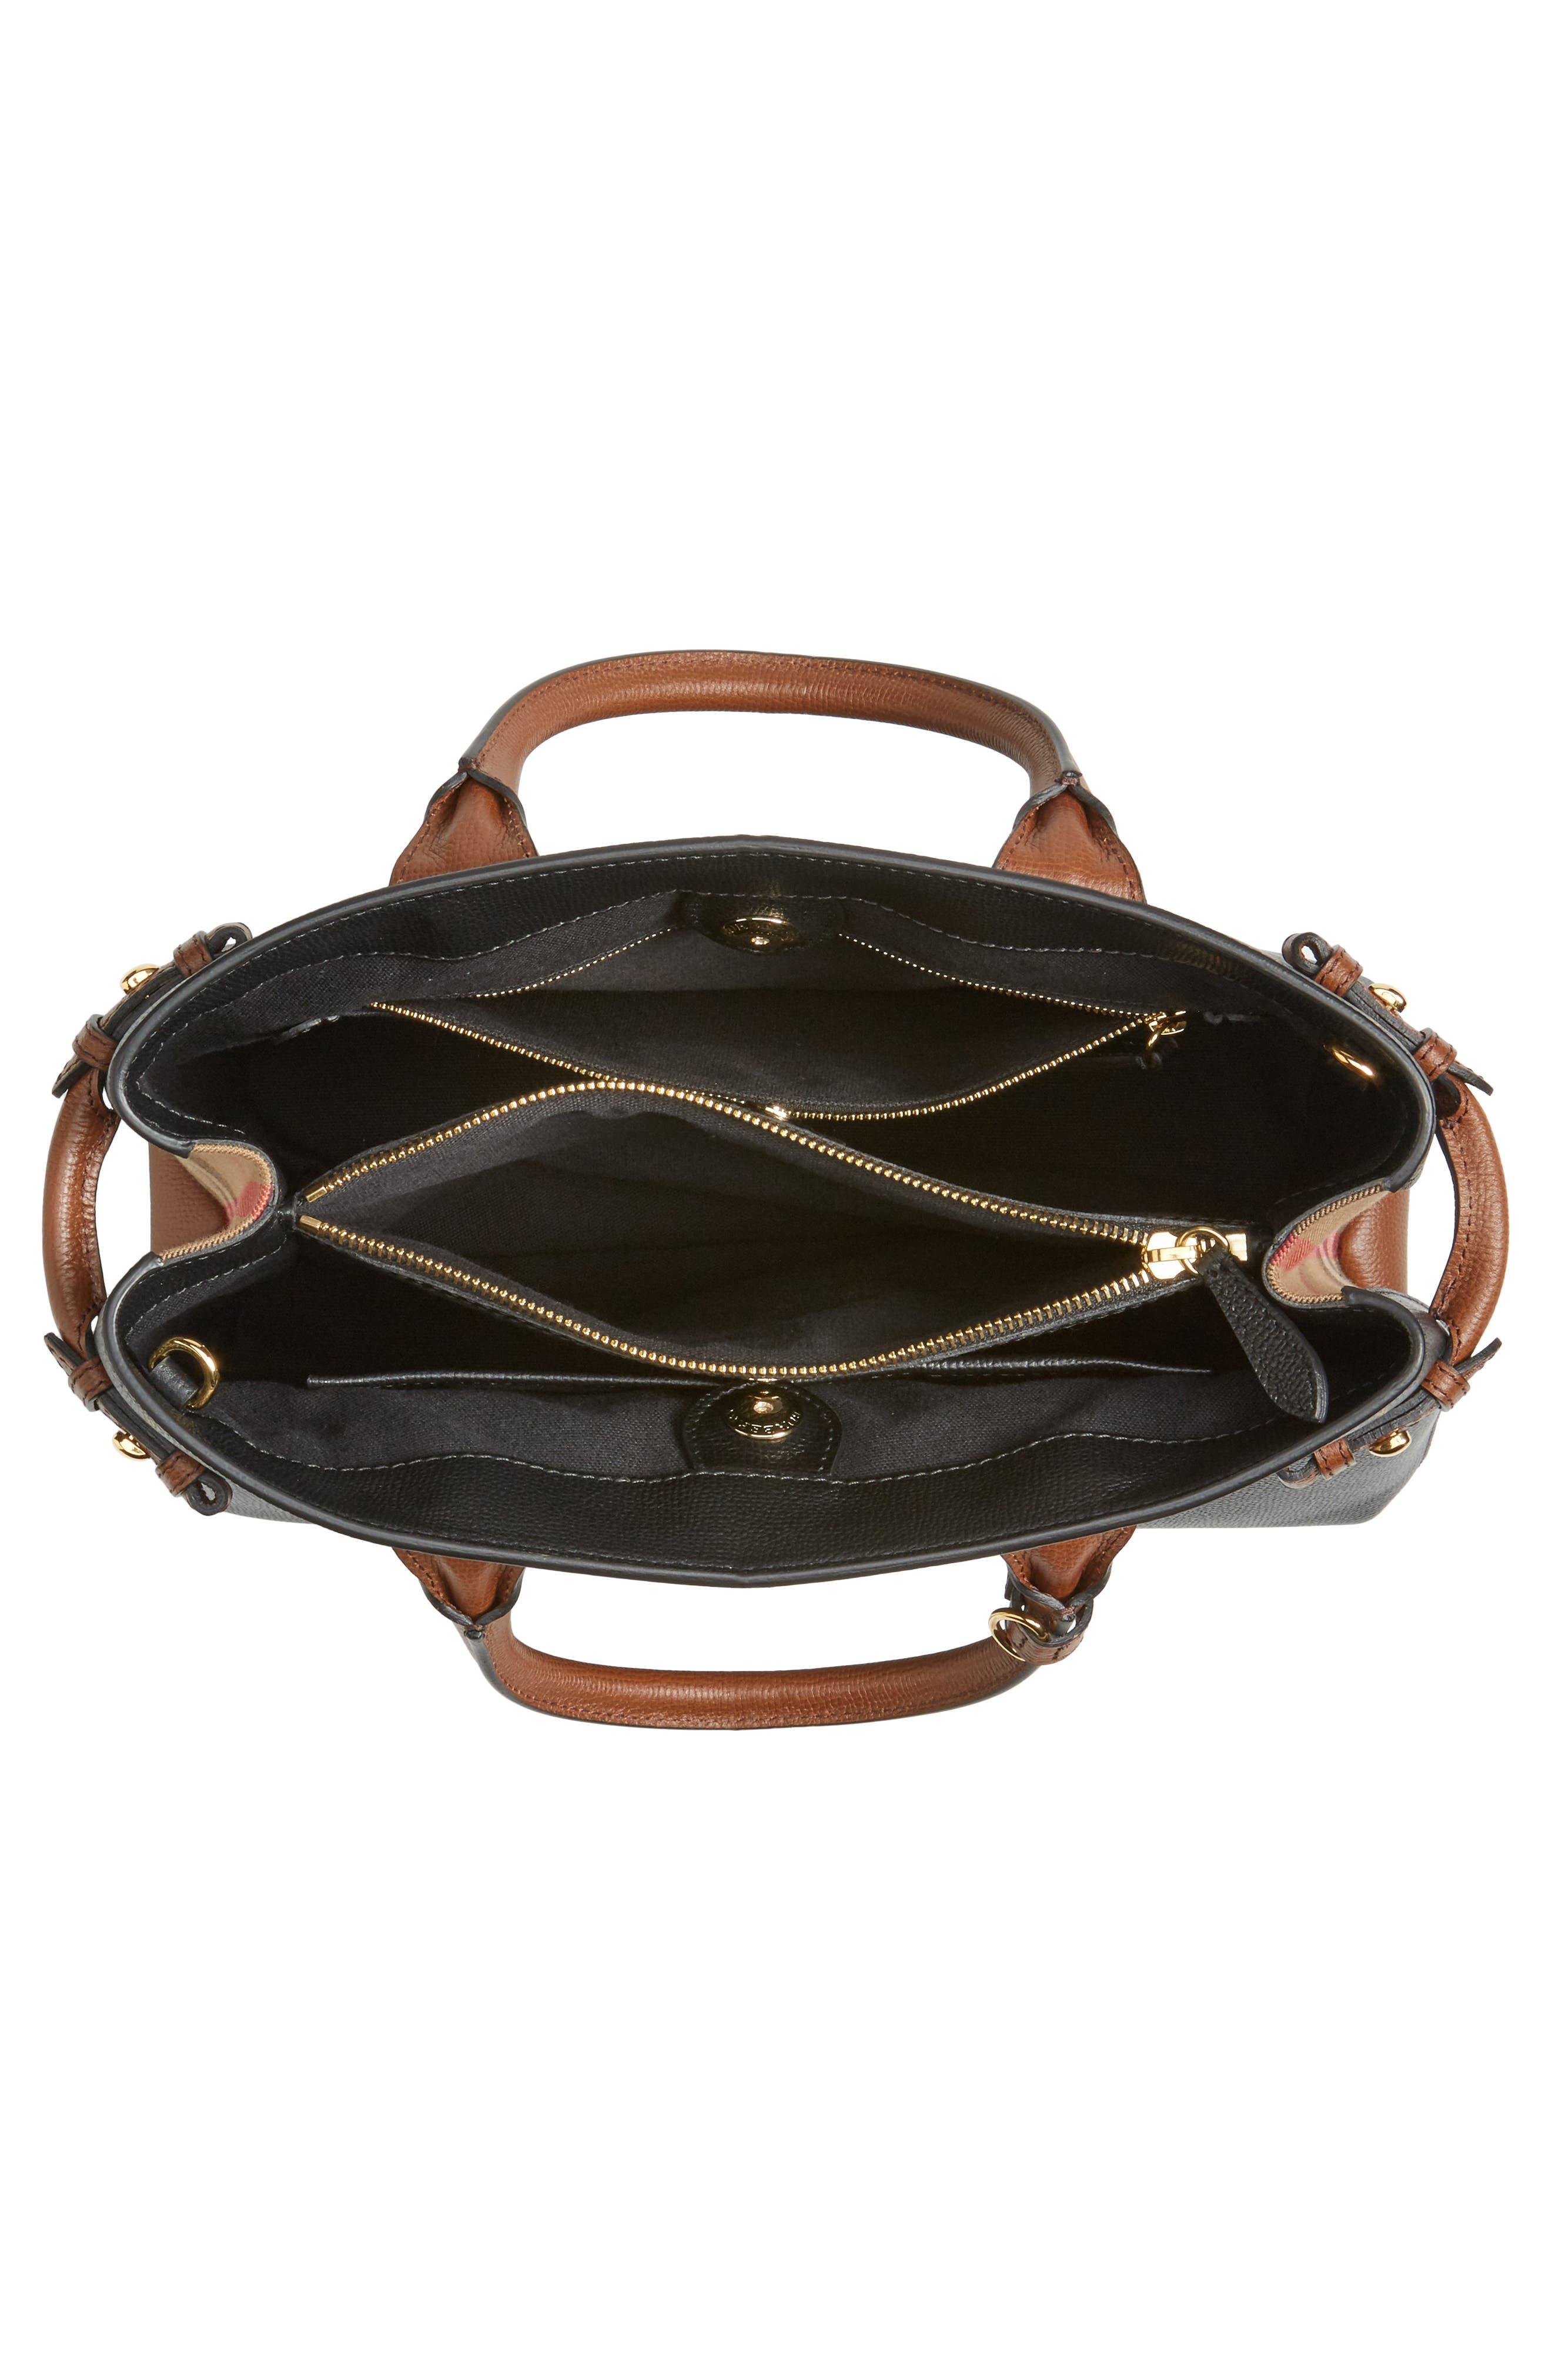 Medium Banner – Derby House Check Leather Satchel,                             Alternate thumbnail 4, color,                             001